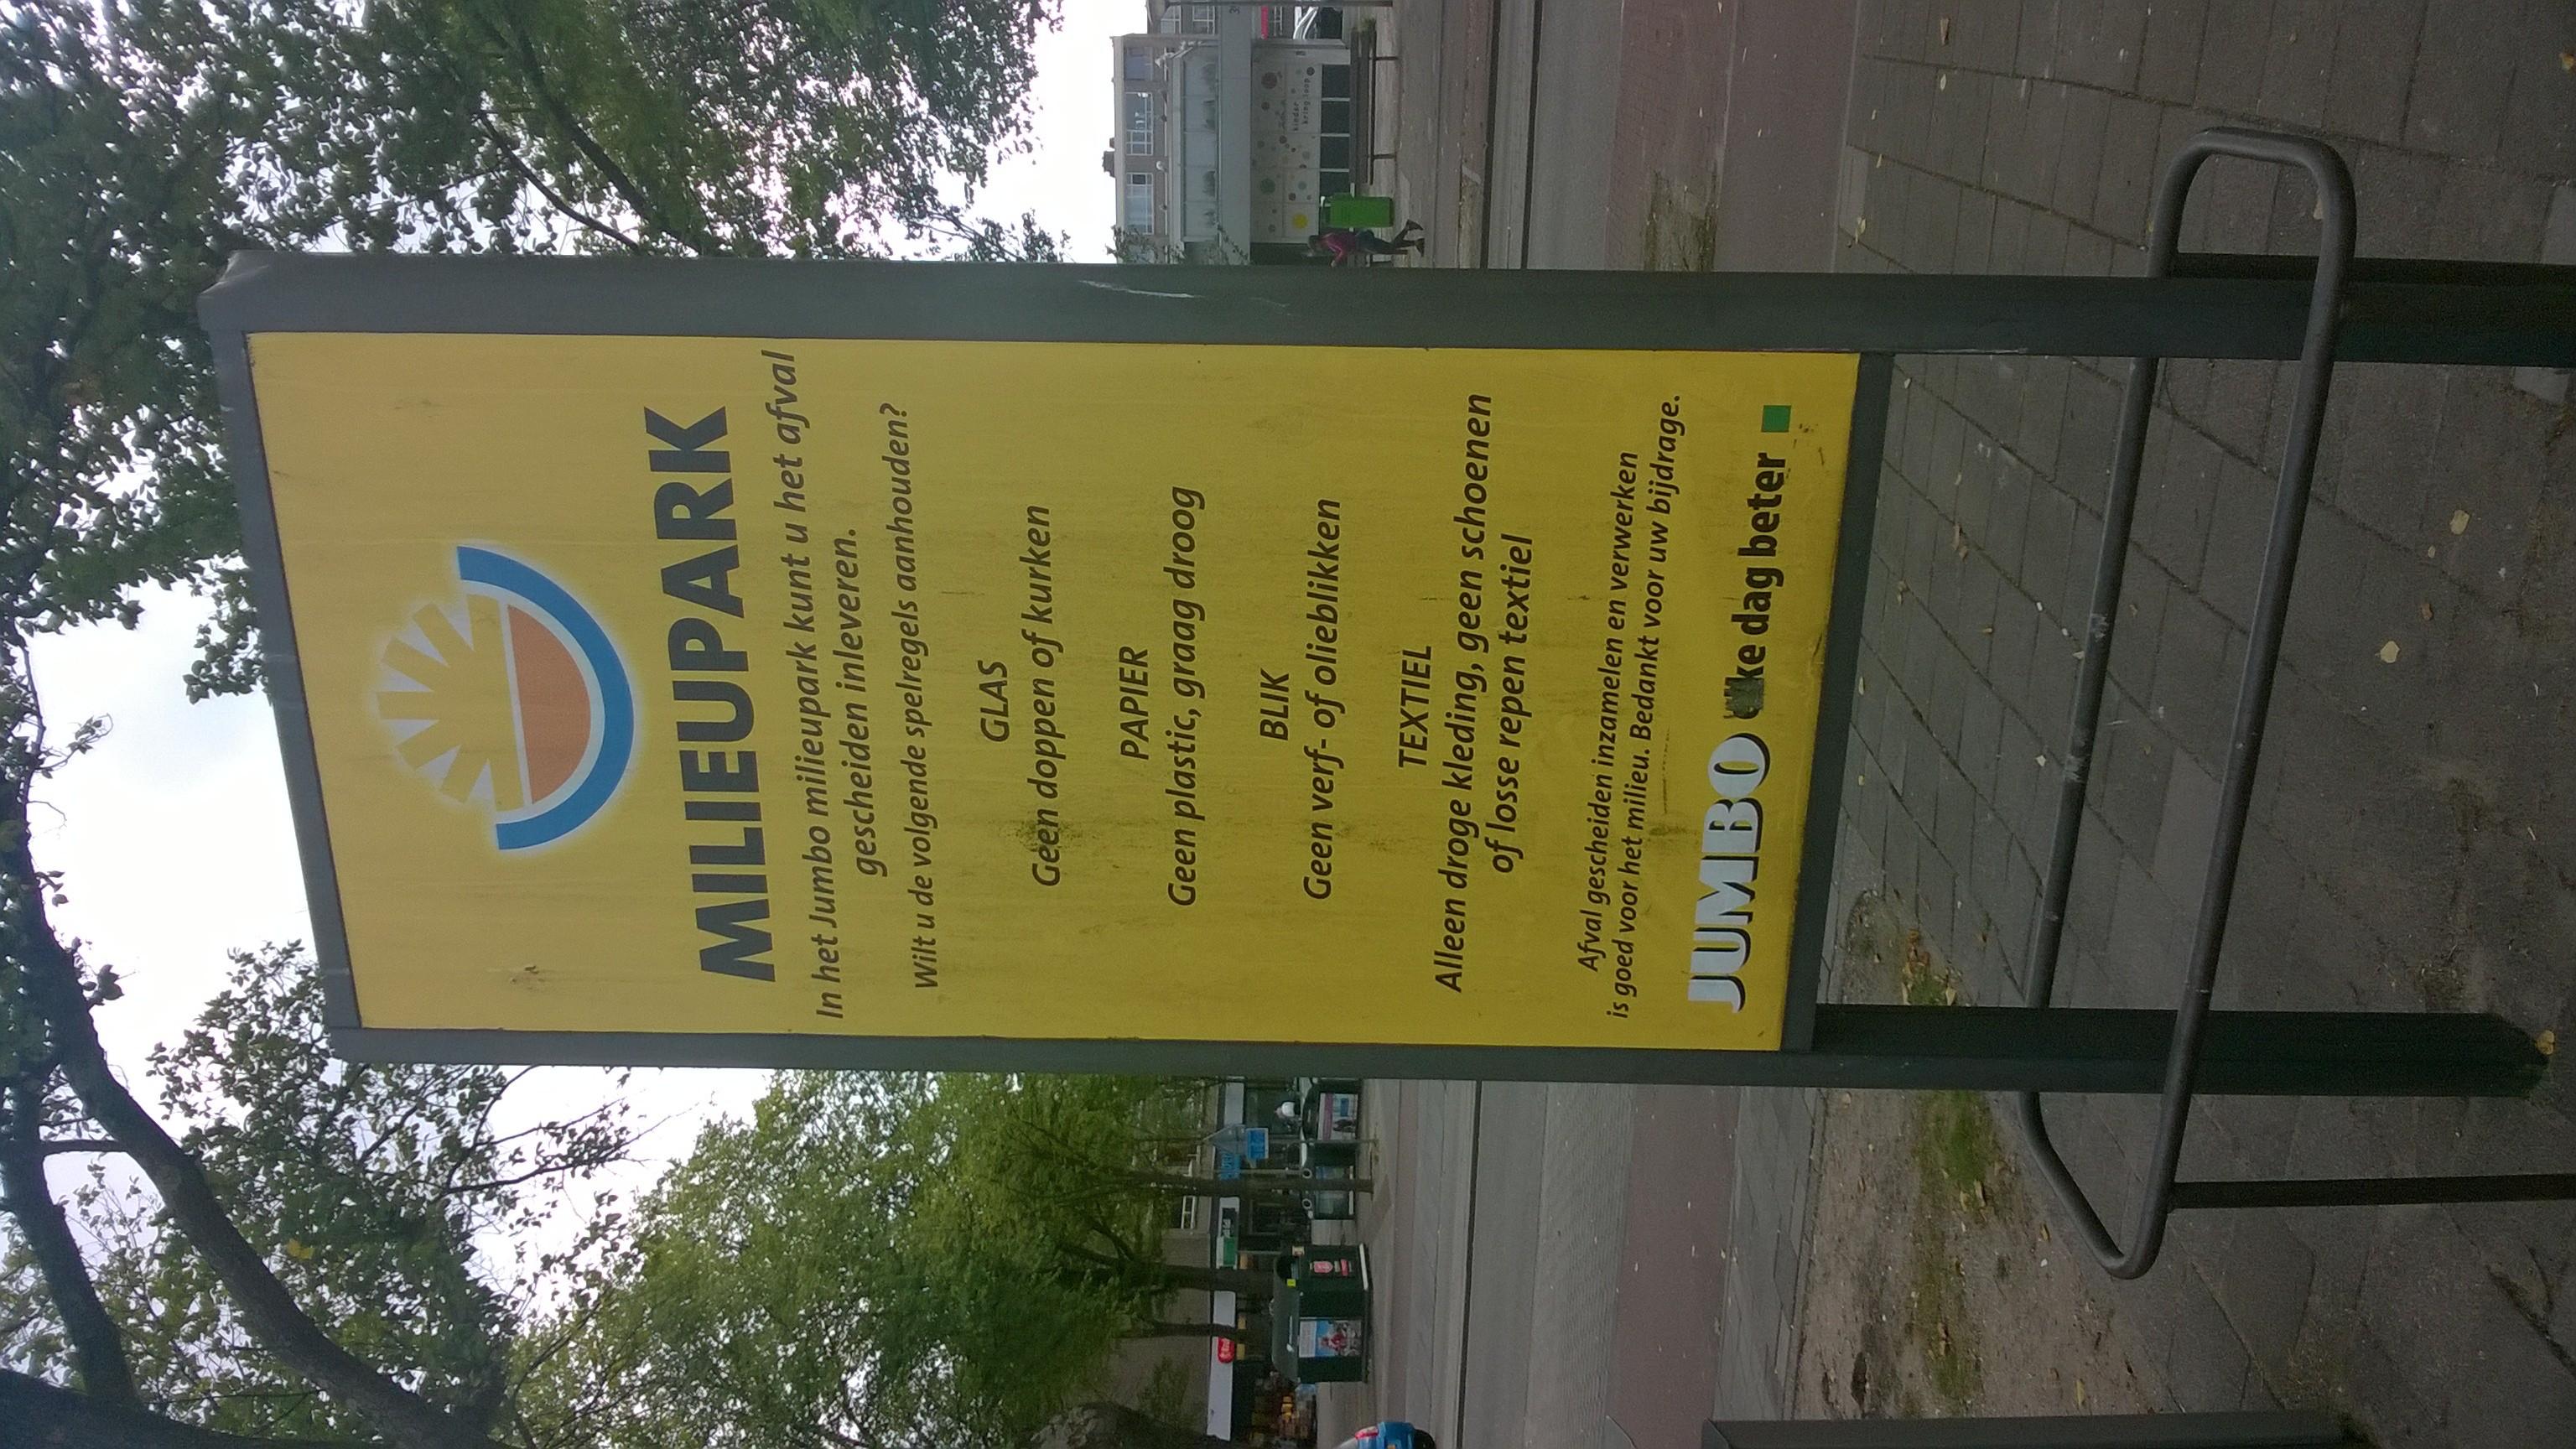 Verfwinkel Den Haag : File:jumbo mileupark sign the hague 2018 .jpg wikimedia commons